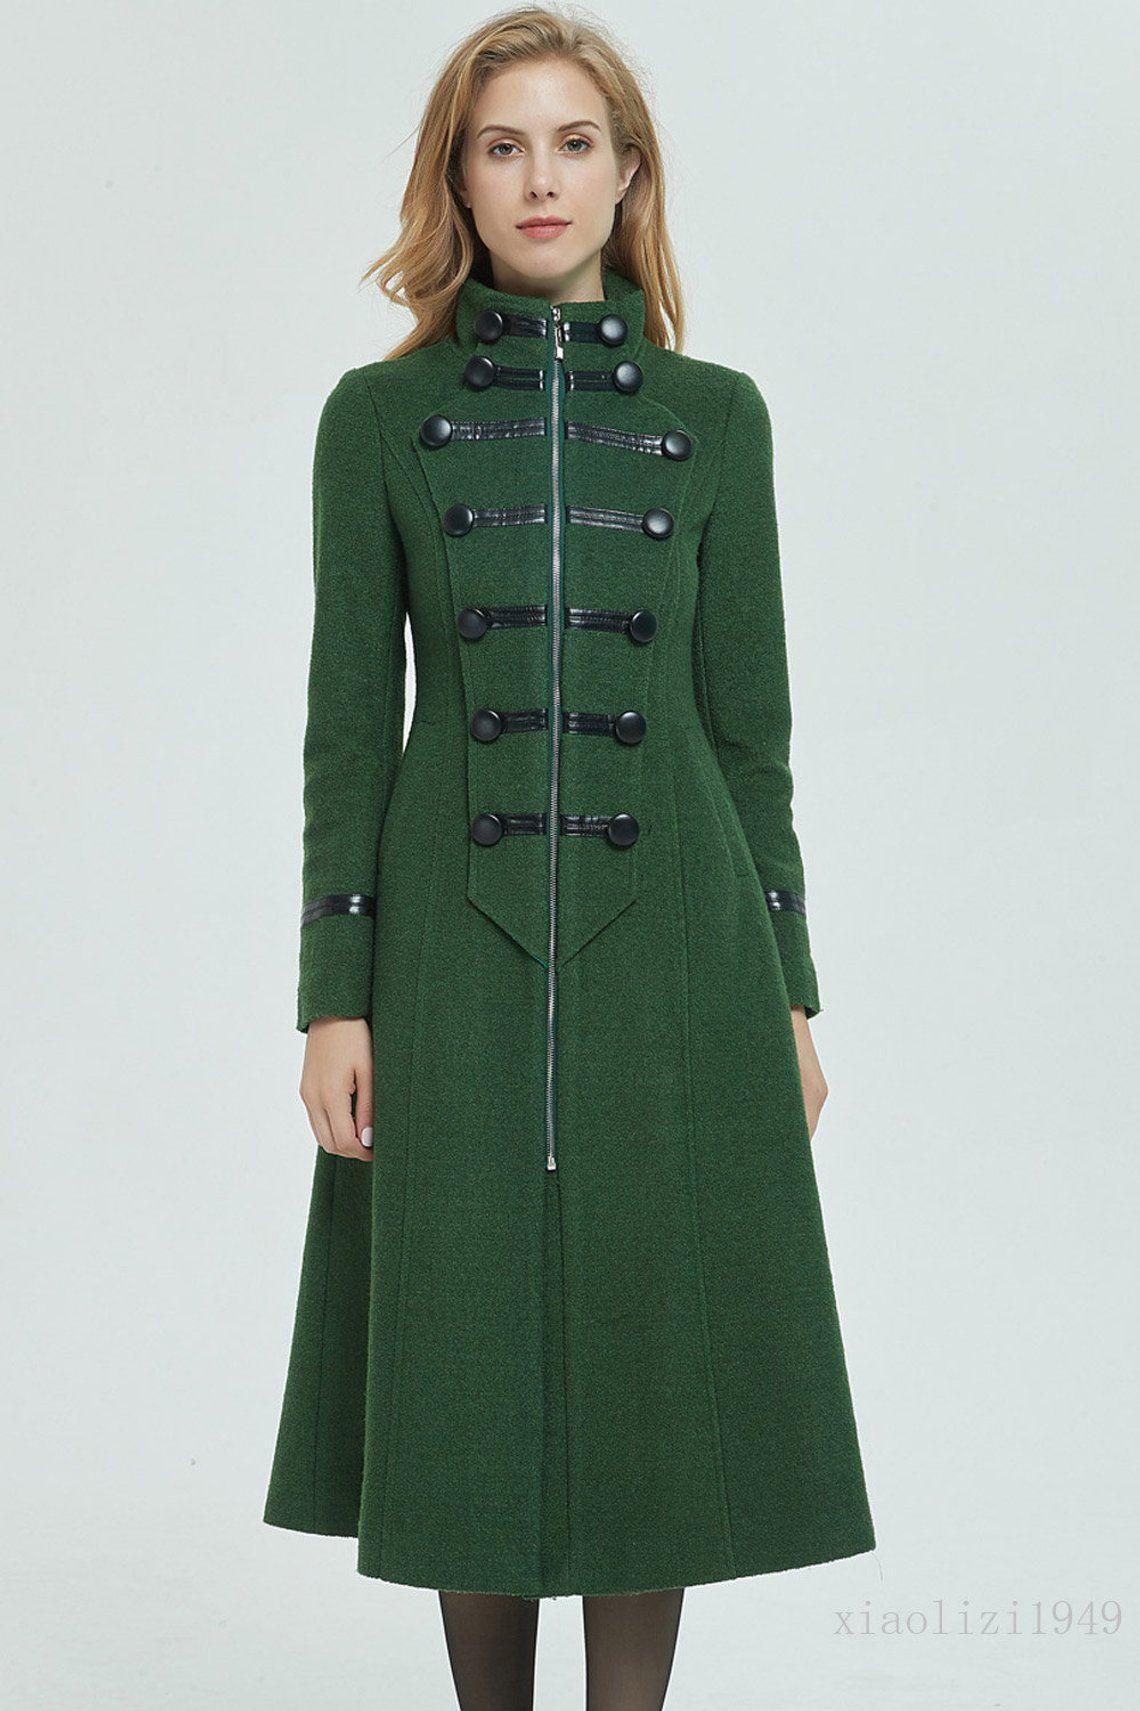 Lange Wolle Mantel, Wintermantel, Damen Mantel, grüner